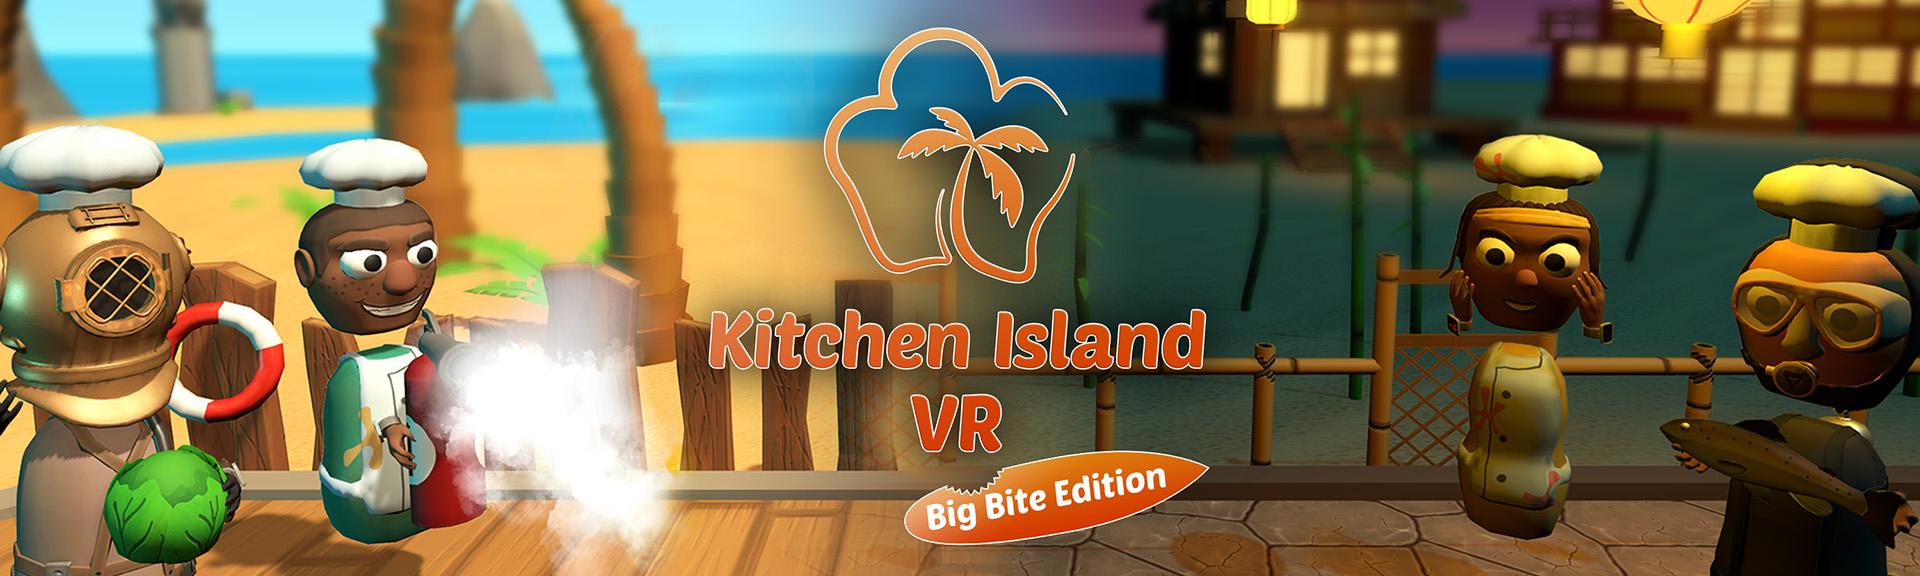 Kitchen Island VR - The Big Bite Edition